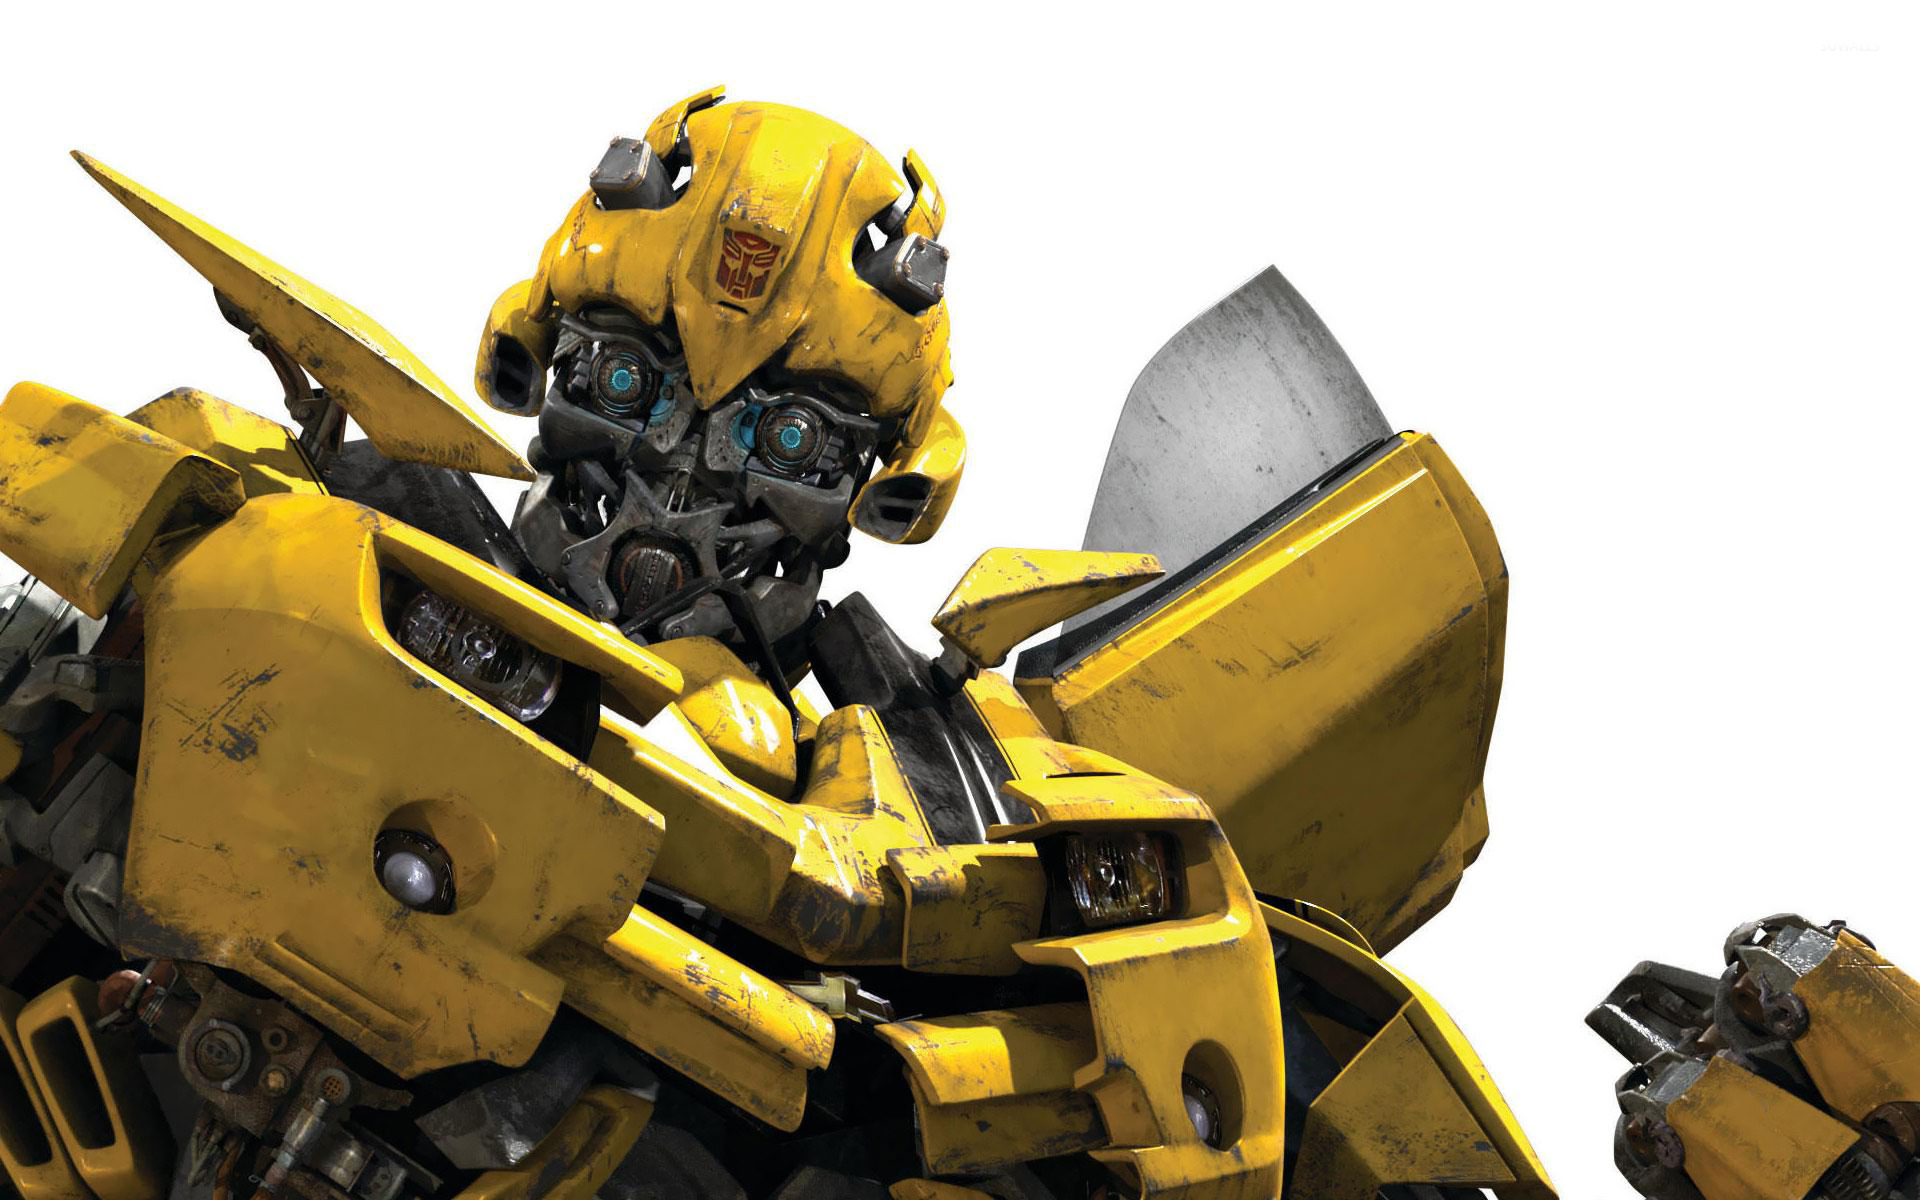 Bumblebee - Transformers [2] wallpaper - Movie wallpapers ...